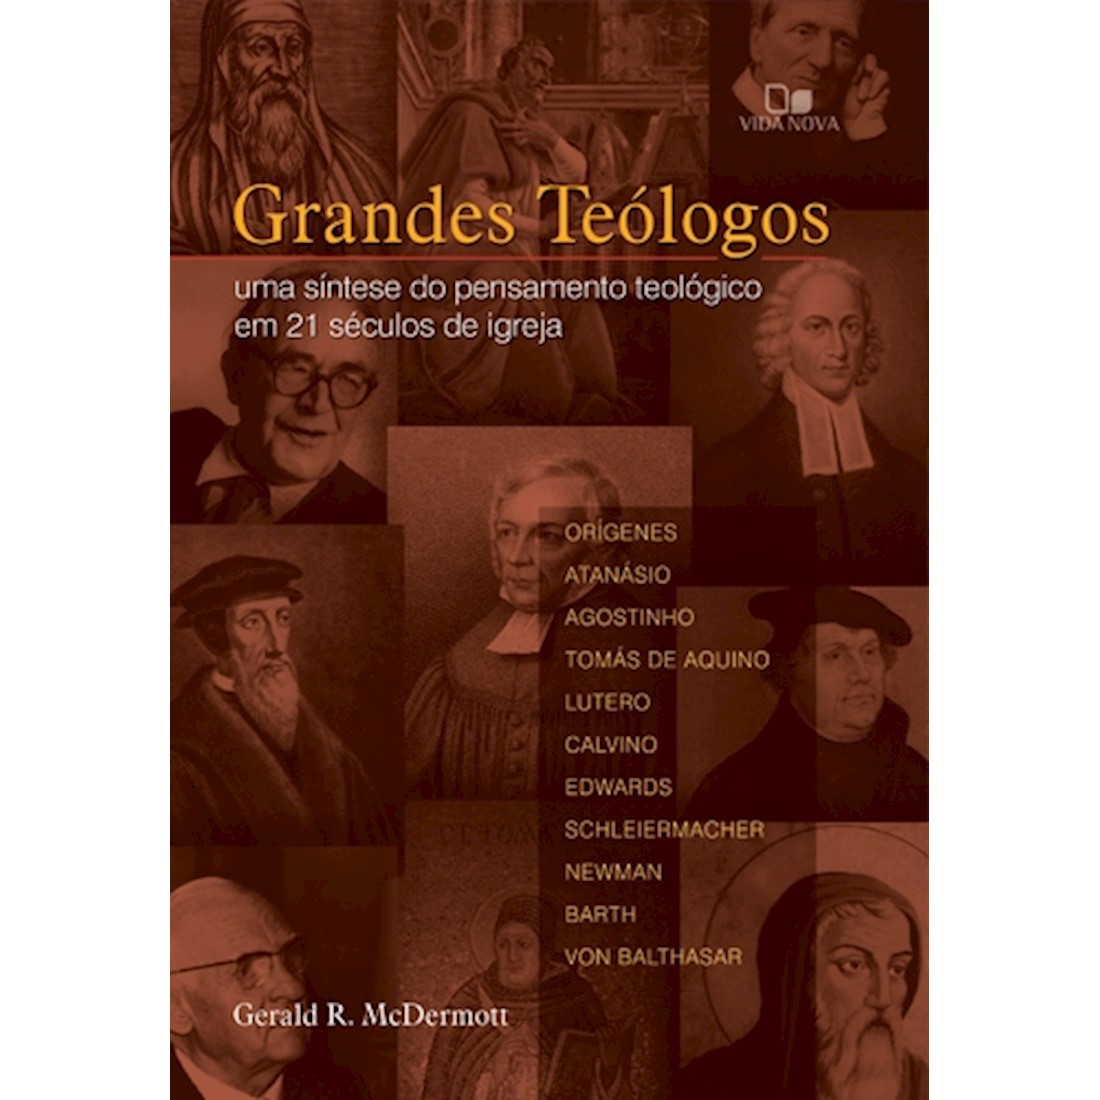 Livro Grandes Teólogos